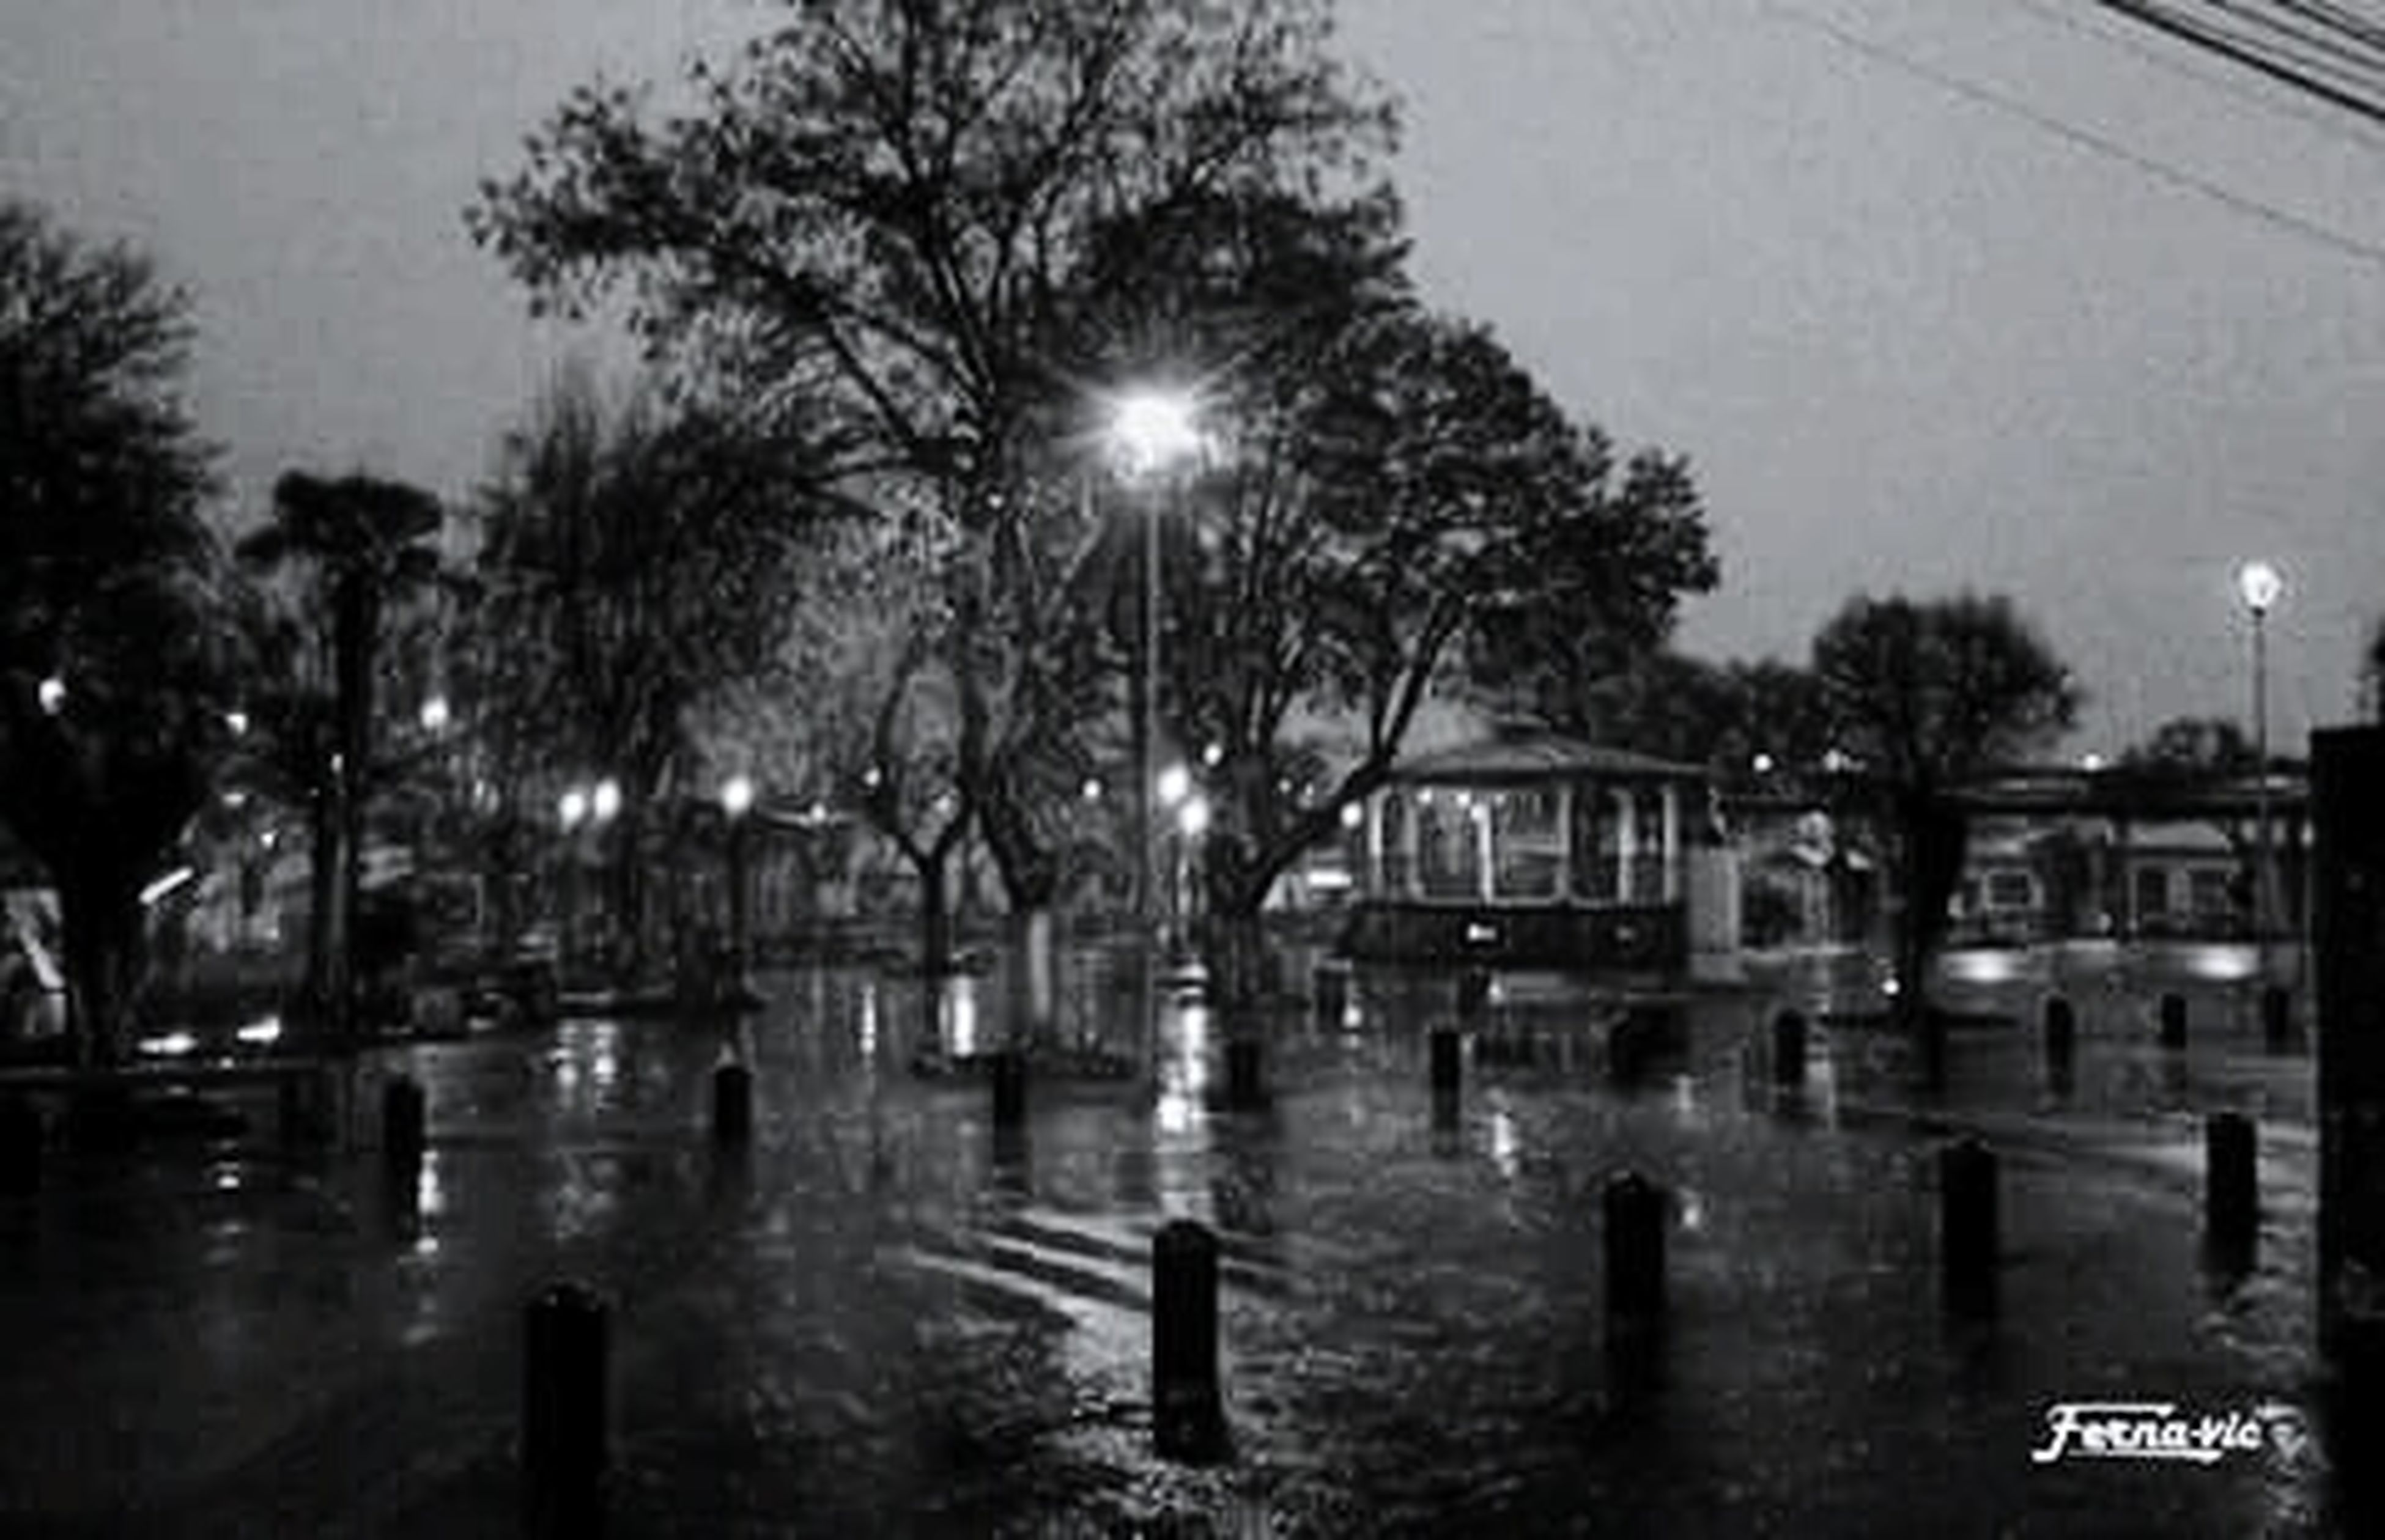 Noche de Lluvia (foto sacada por mi papa) -San Rosendo- /Chile/ ☺👍👌 Maka Sanrokee Love